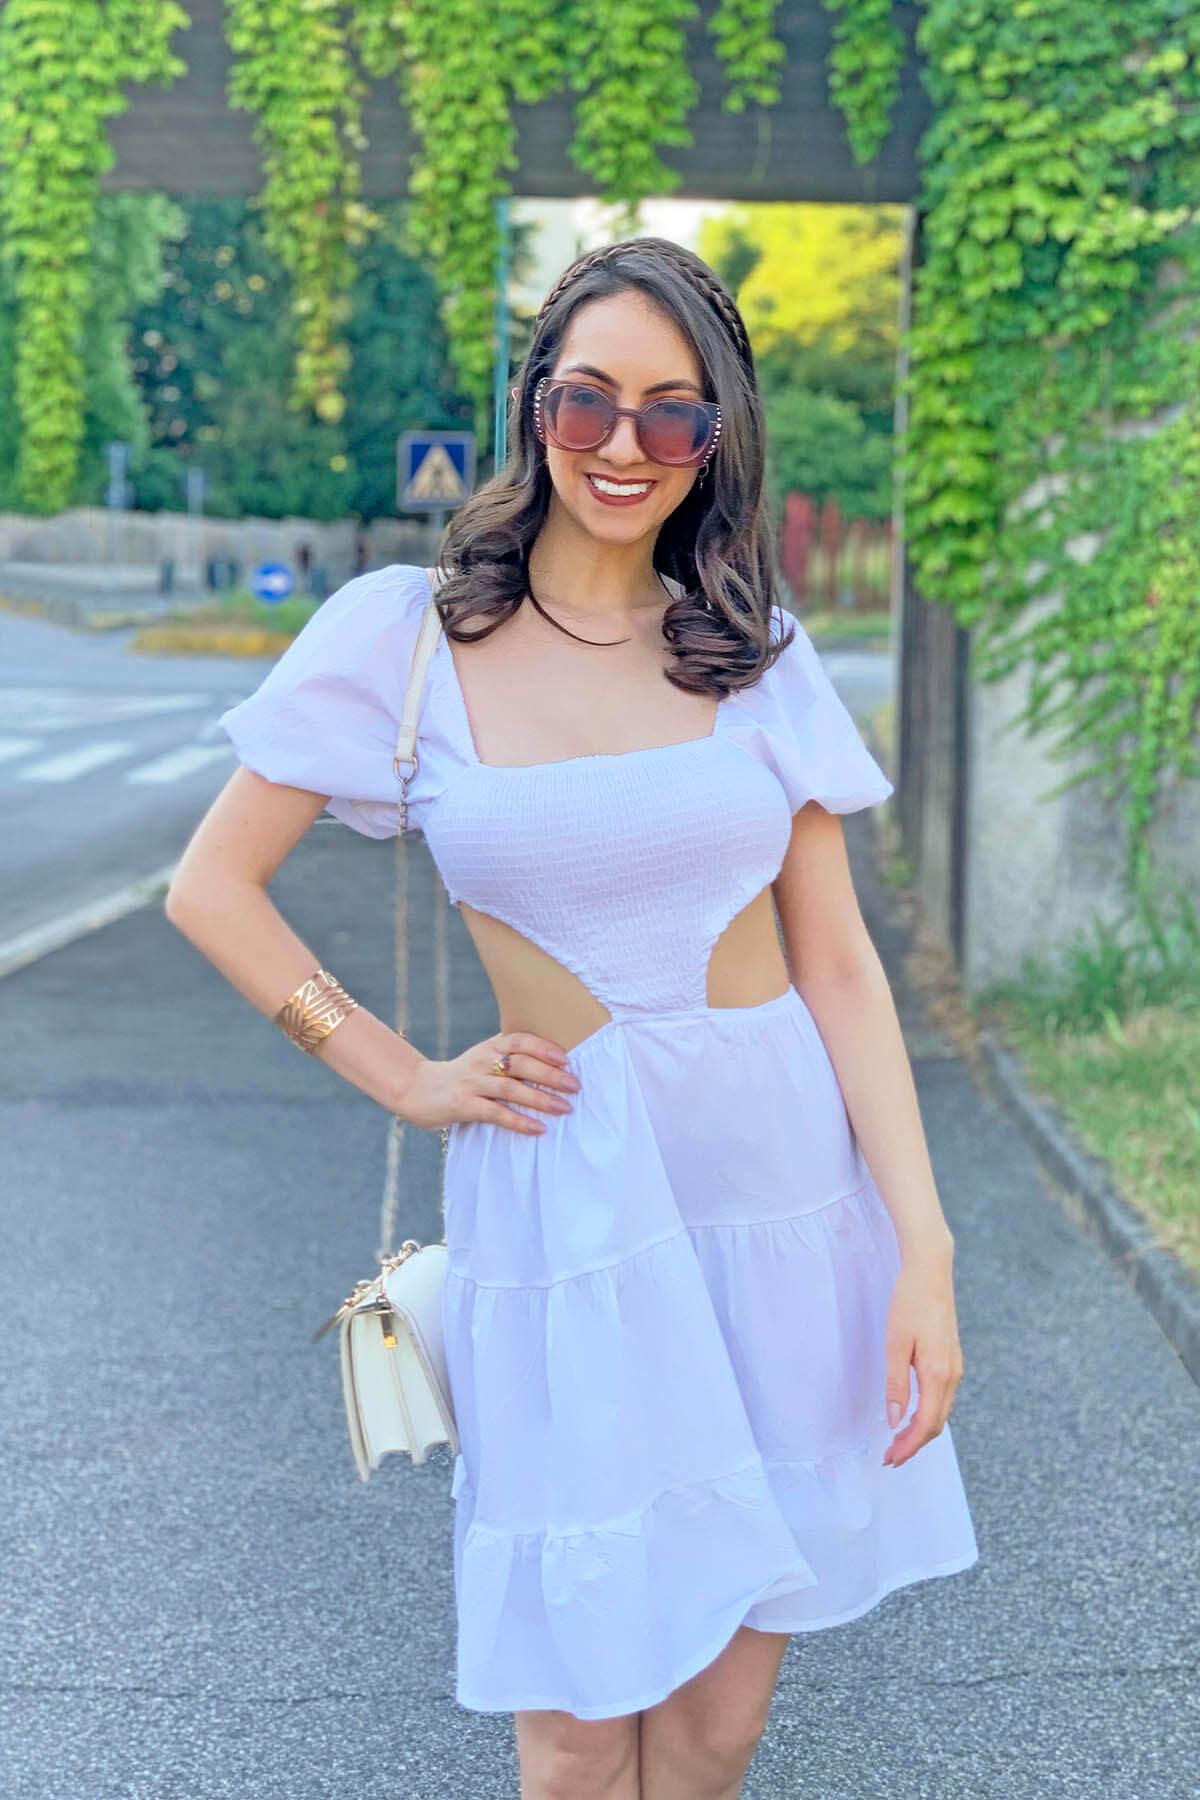 White dress - Lili Fairy review